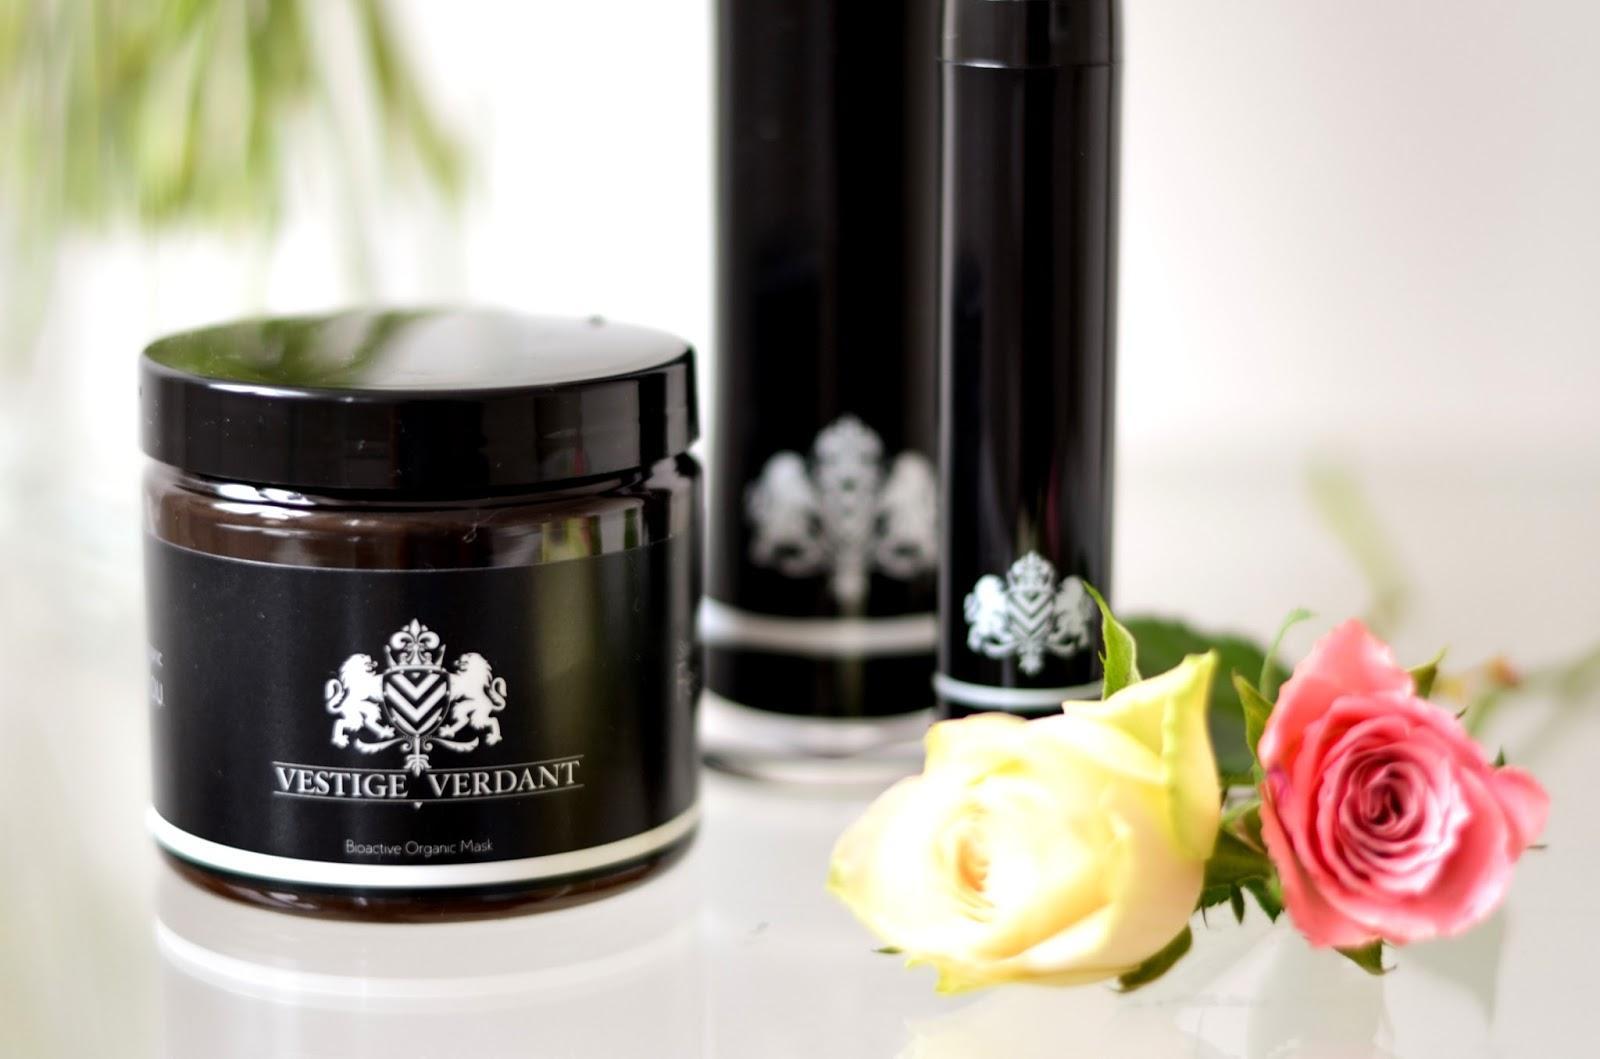 vestige verdant luxury organic skincare organic face mask